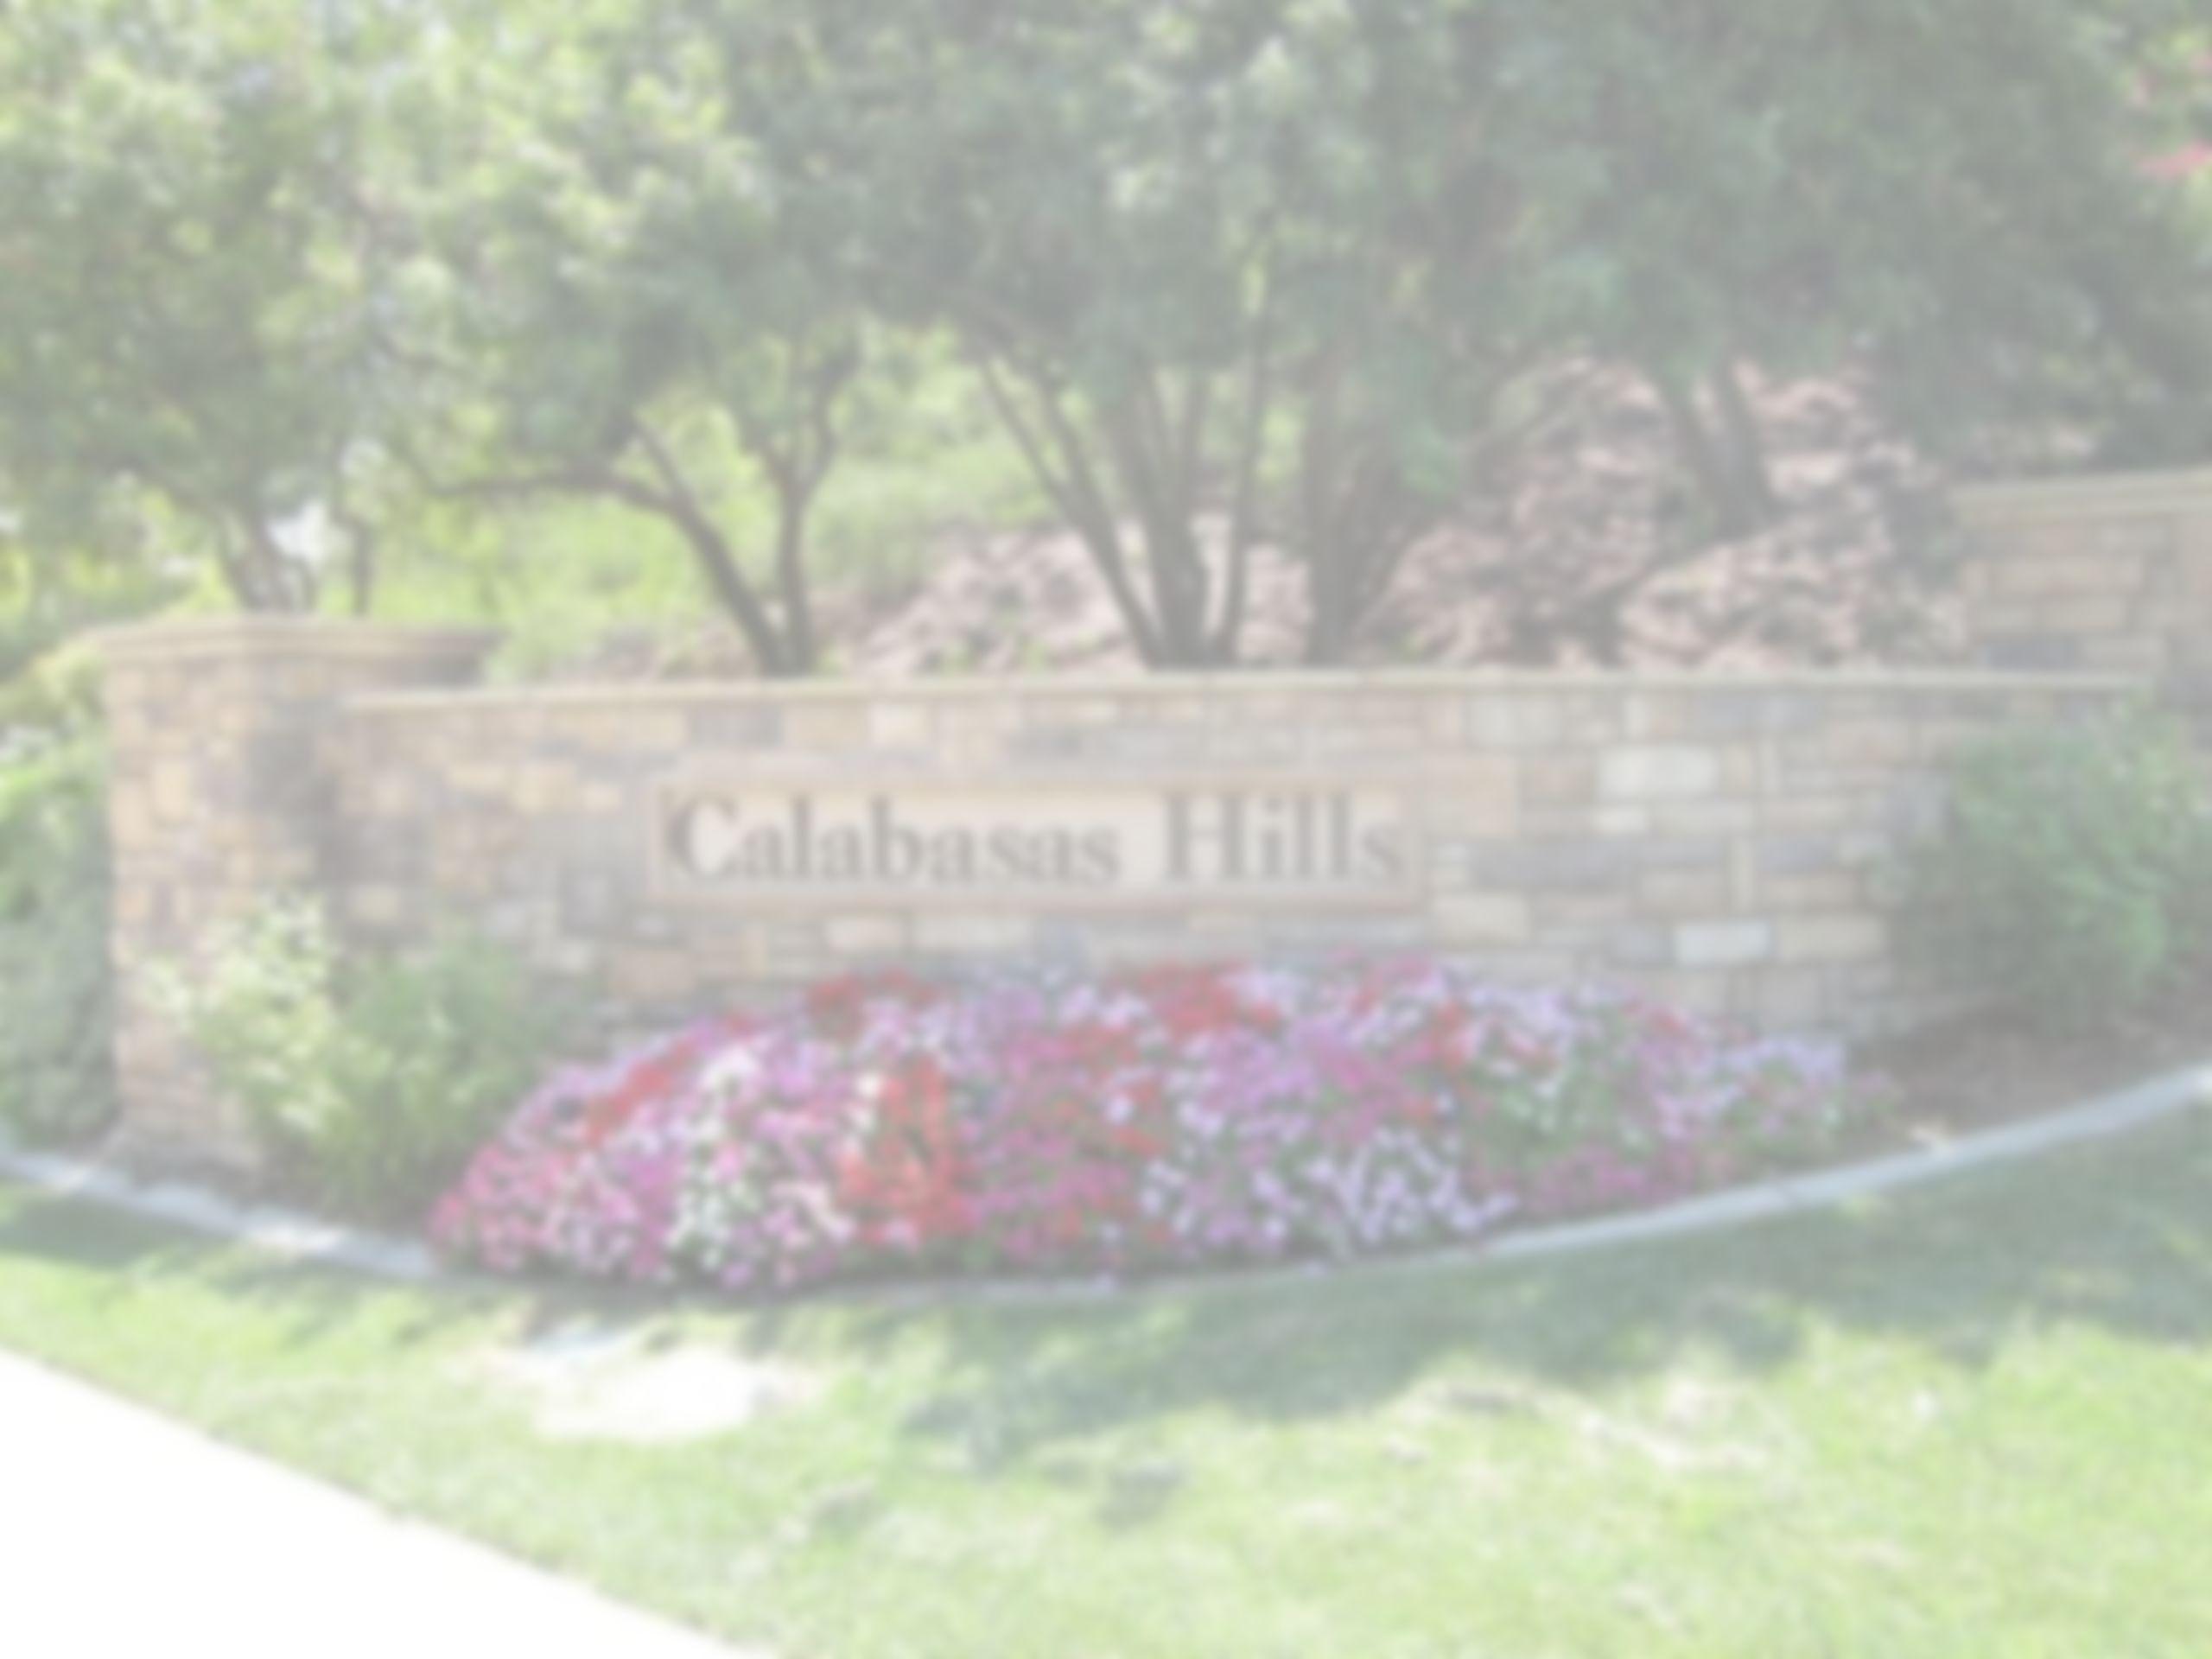 Calabasas Hills Estates